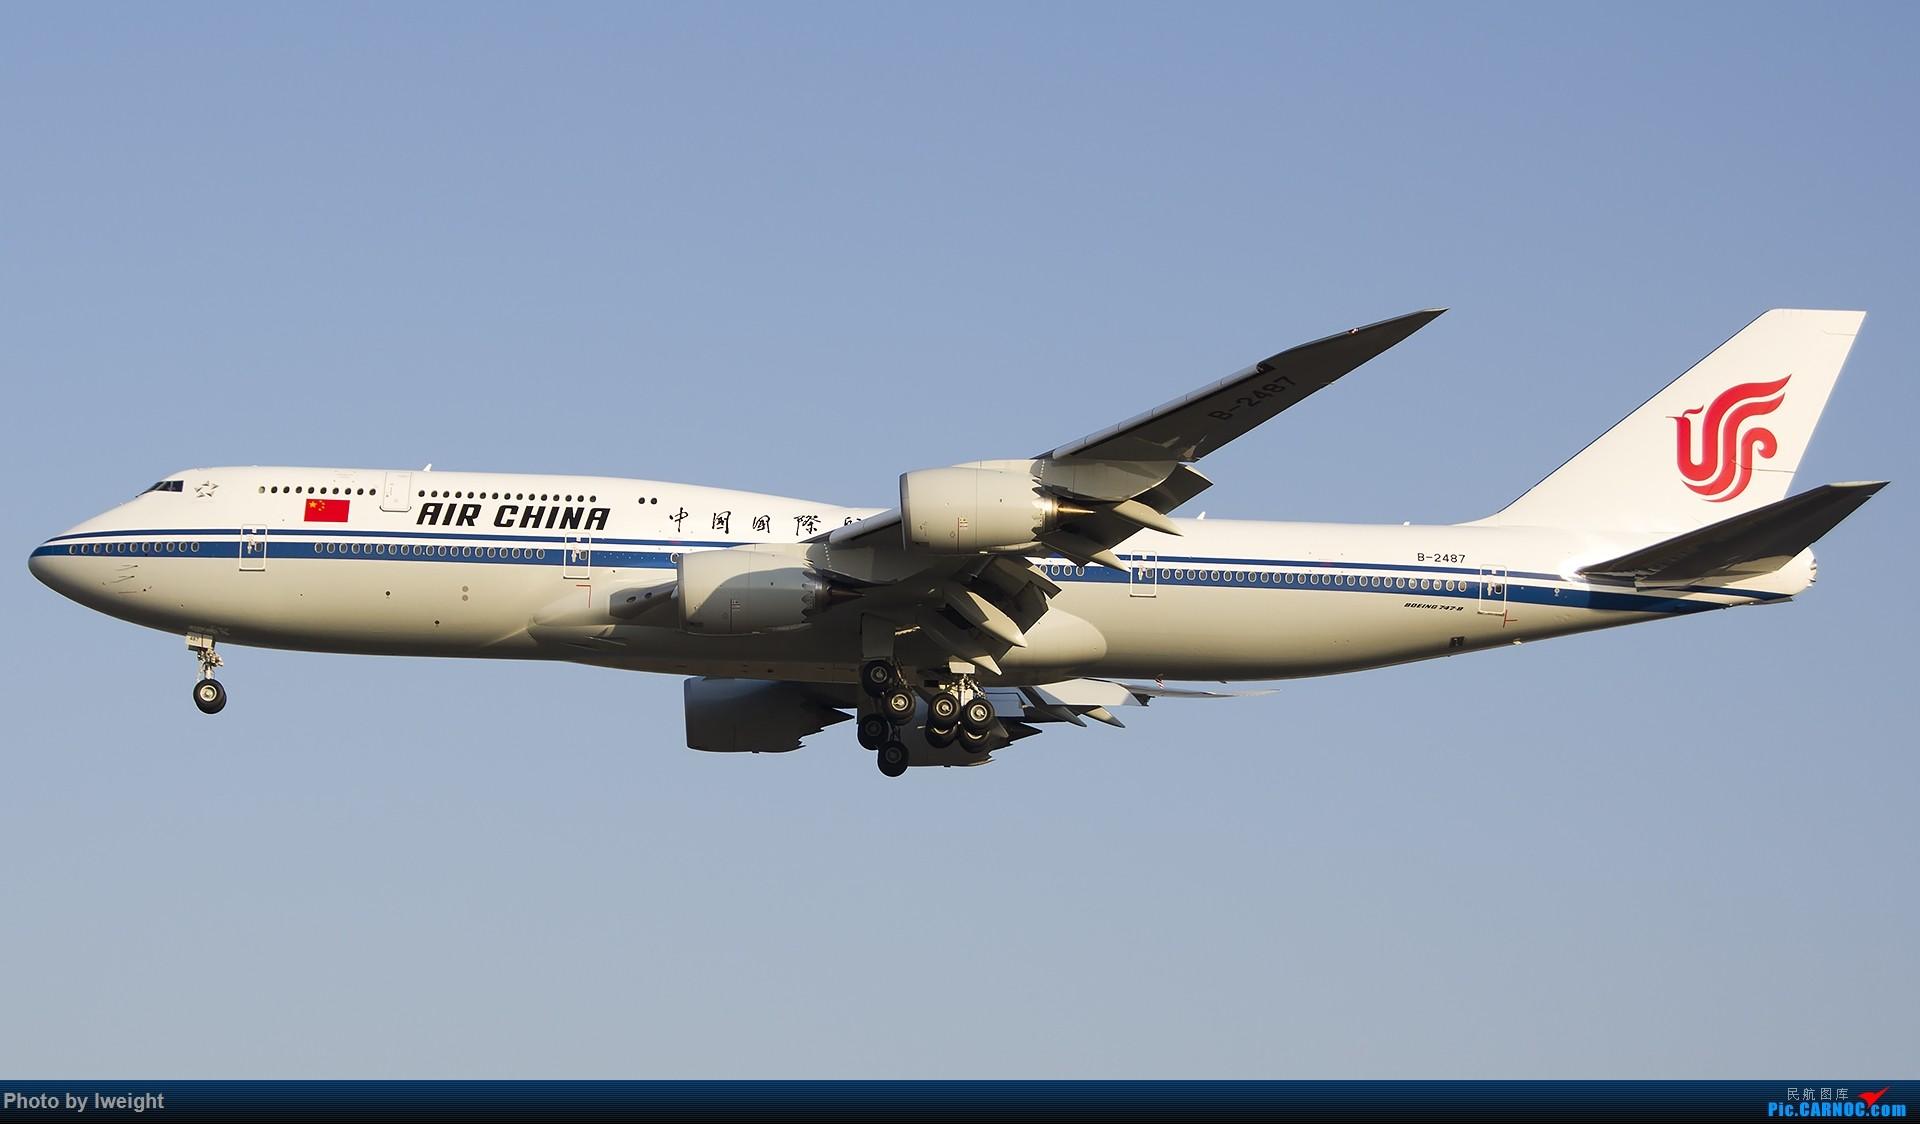 Re:[原创]庆祝升级777,发上今天在首都机场拍的所有飞机【2014-12-14】 BOEING 747-8I B-2487 中国北京首都国际机场